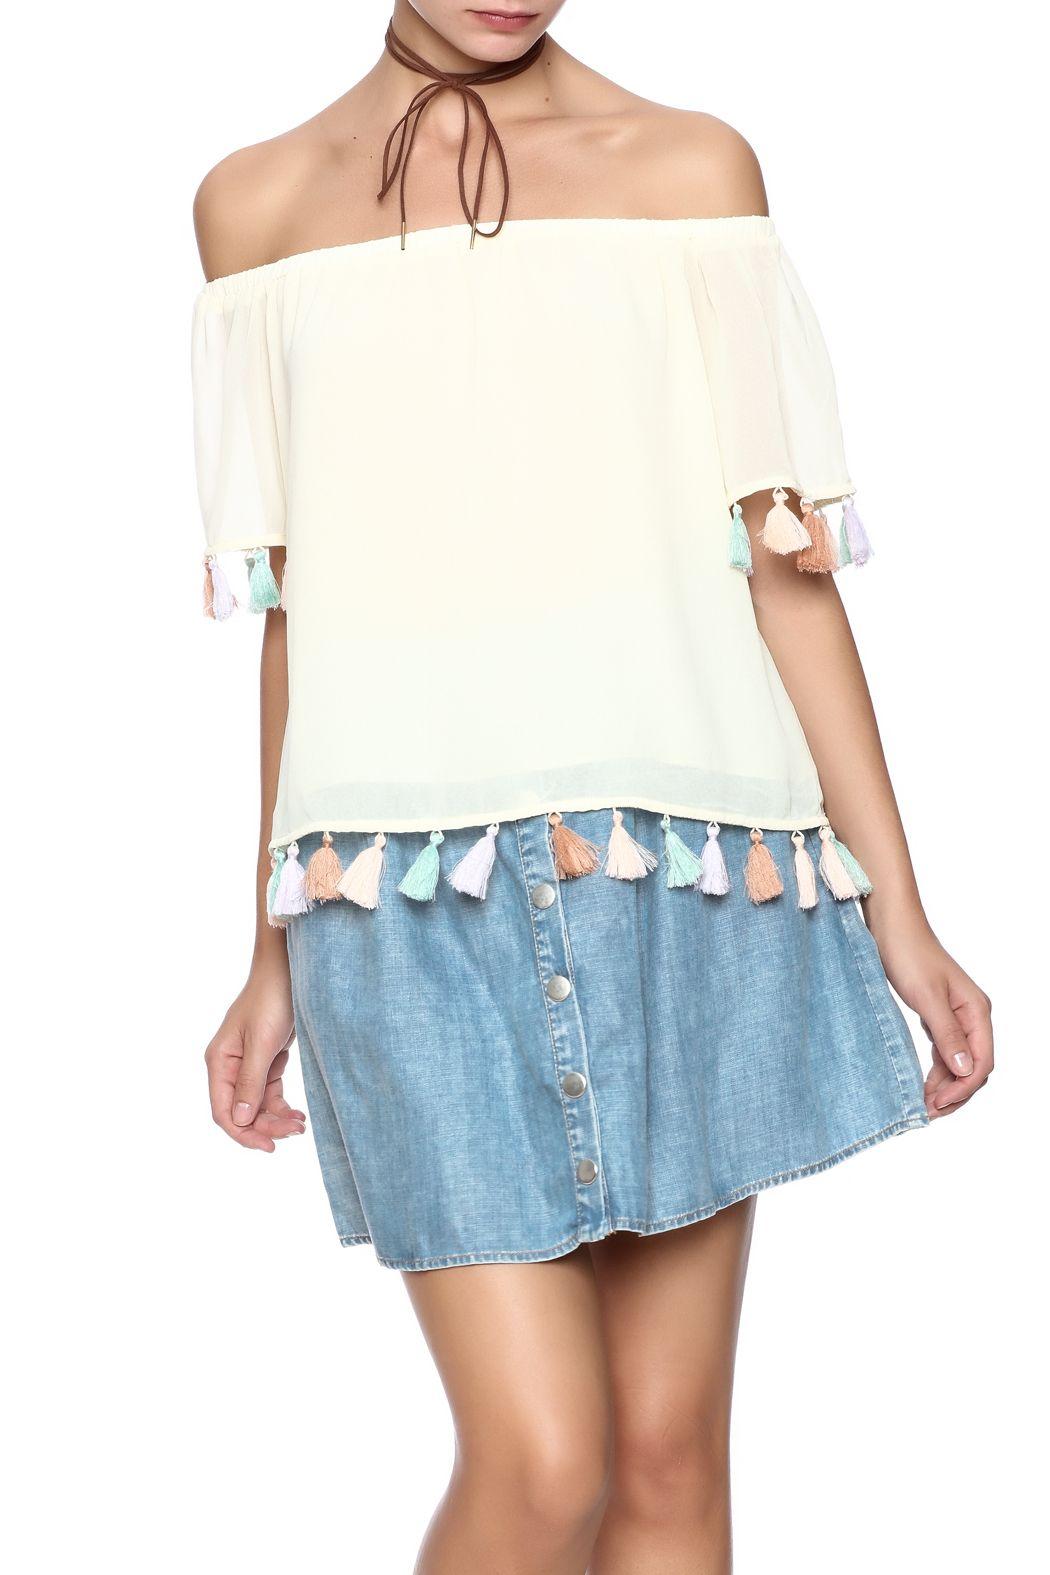 a4b83b429b4 Clothing - Tops - Off The Shoulder Clothing - Tops - Blouses & Shirts  Clothing - Tops - Short Sleeve Louisiana